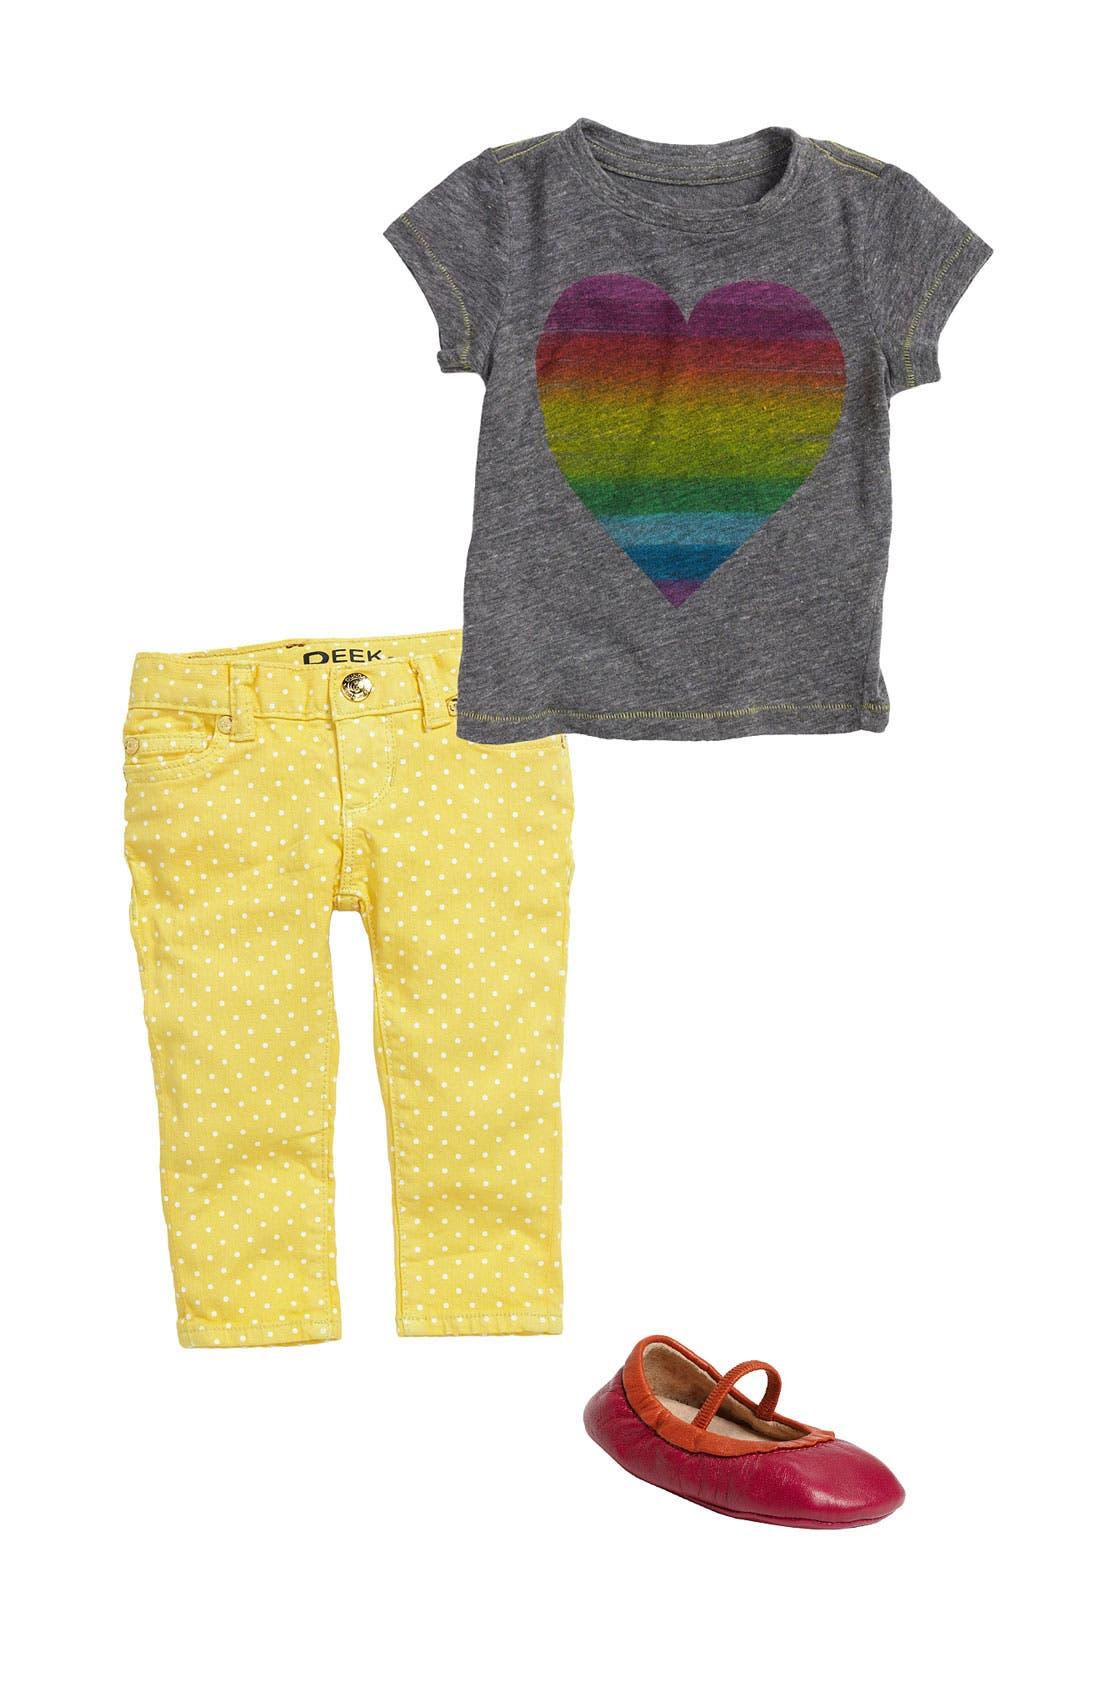 Alternate Image 1 Selected - Peek Tee, Skinny Jeans & Crib Shoe (Infant)